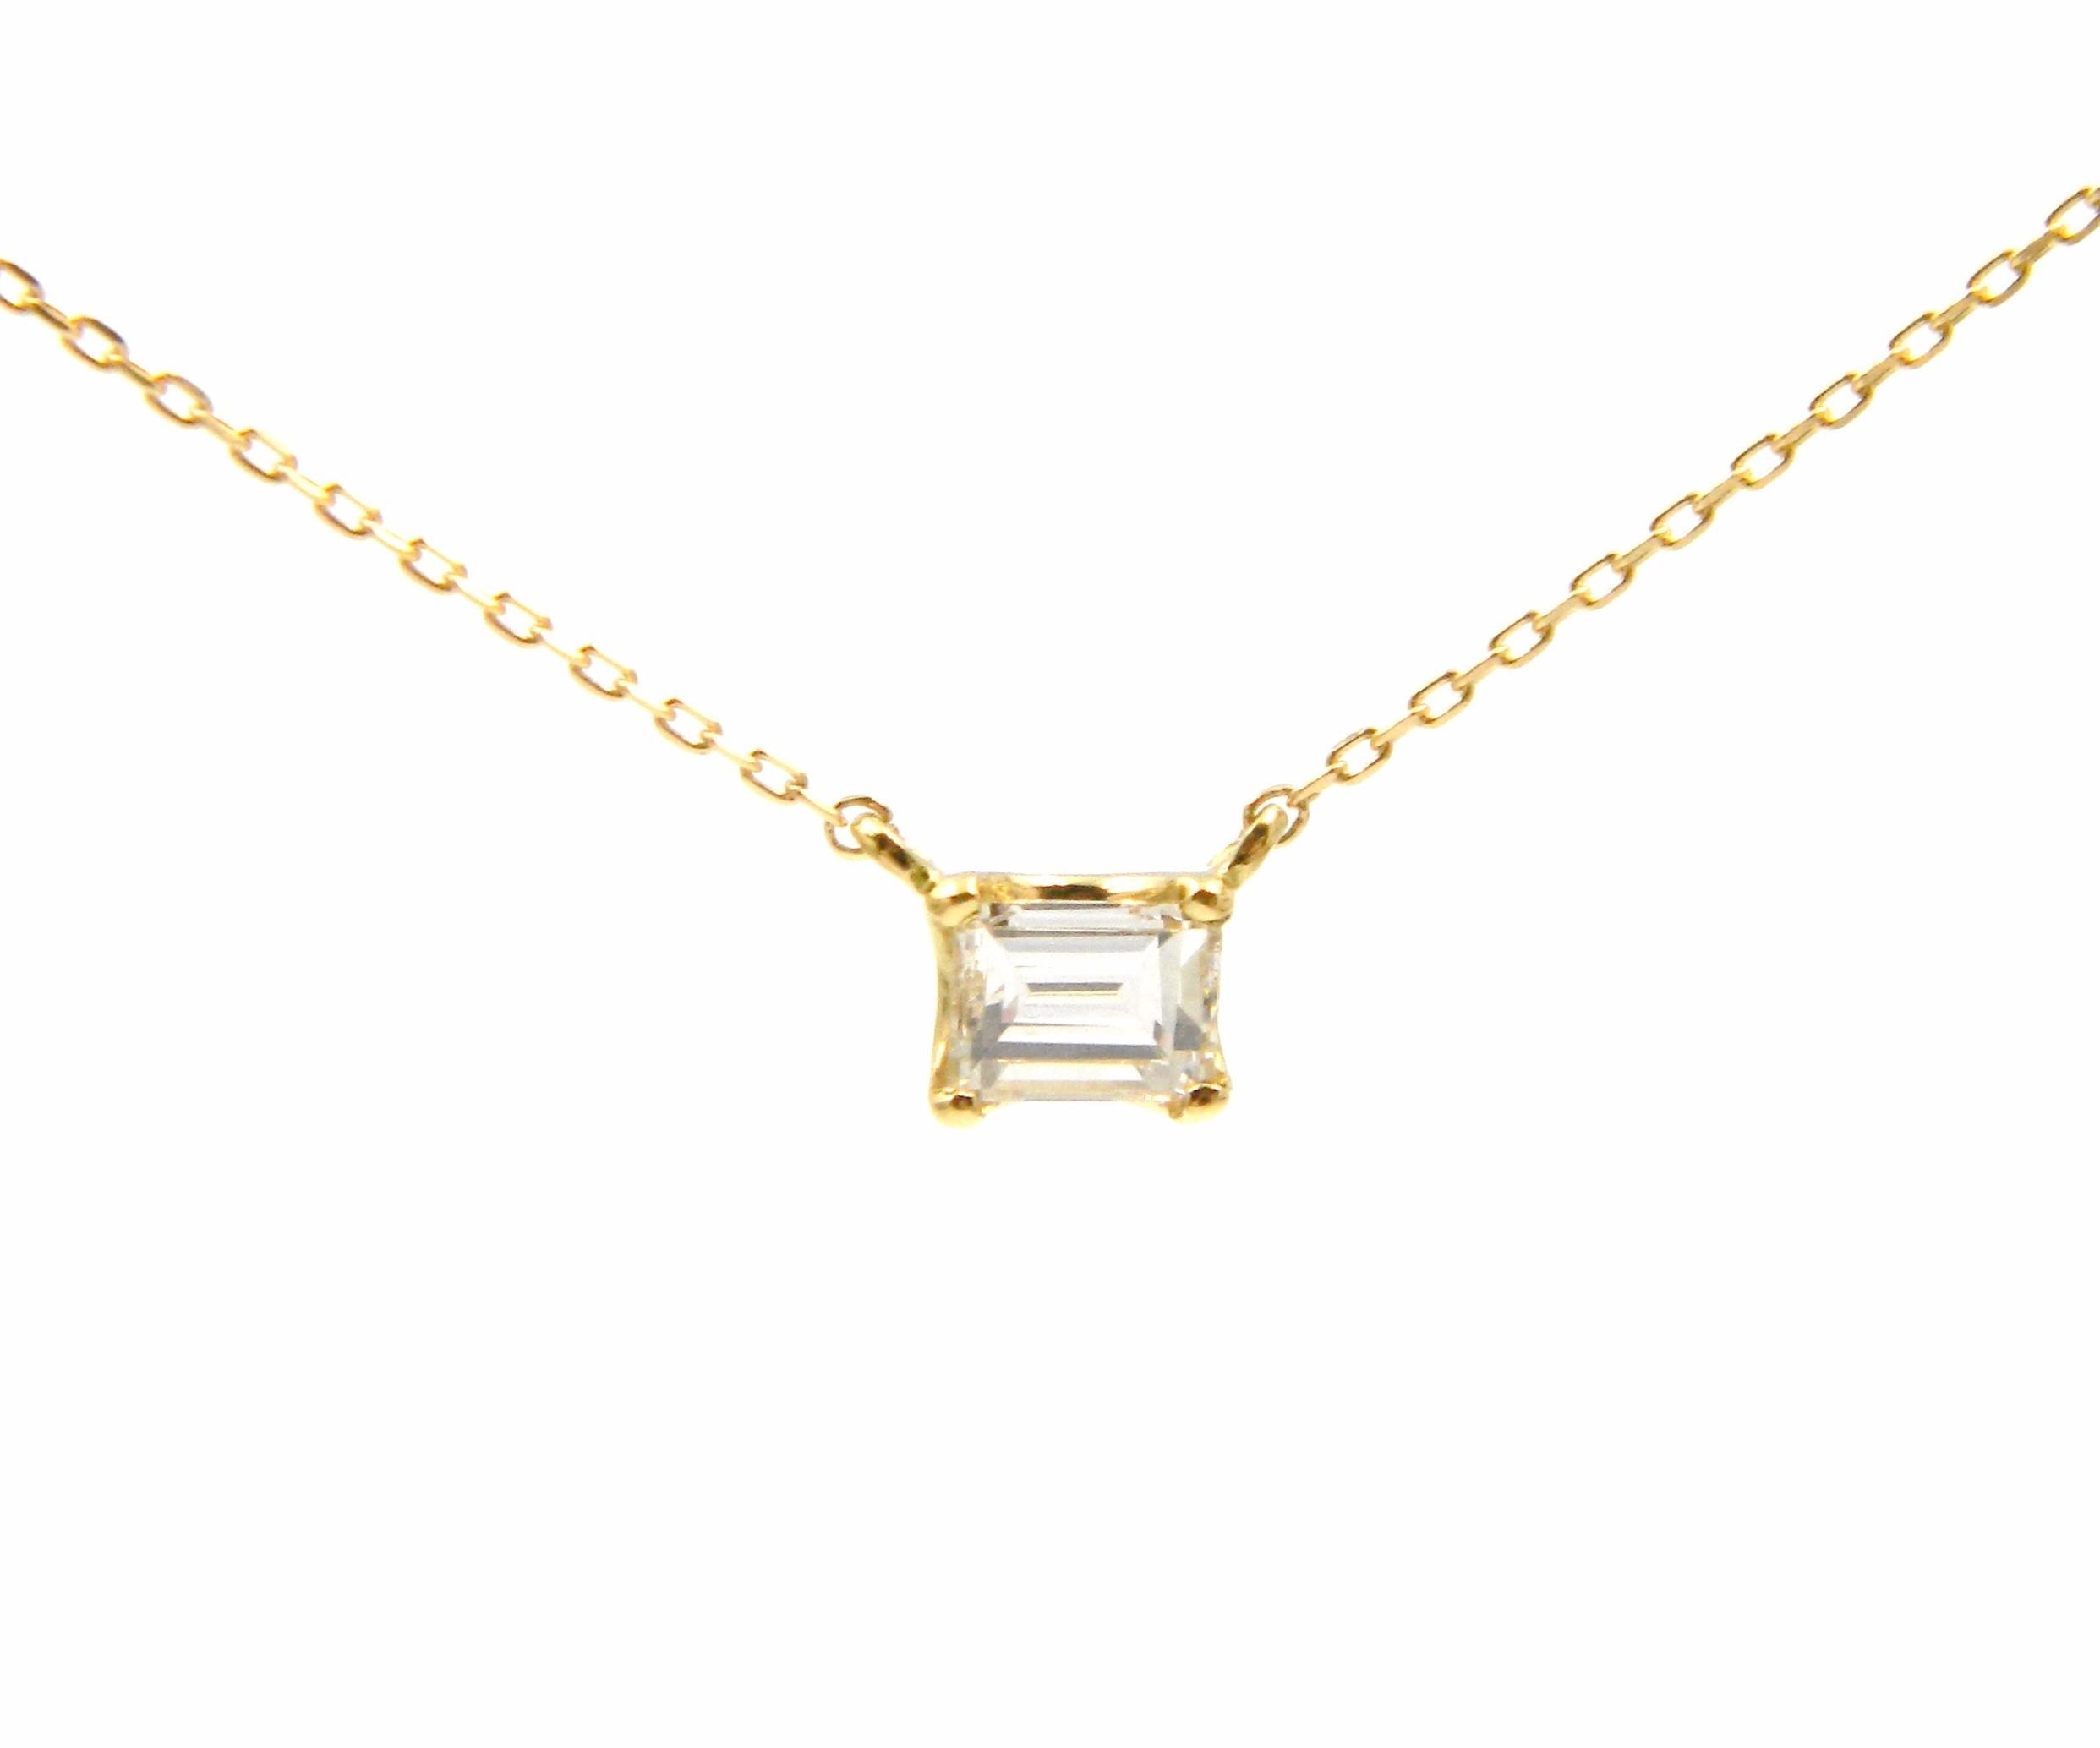 Yellow Gold Diamond Solitaire Pendant Necklace